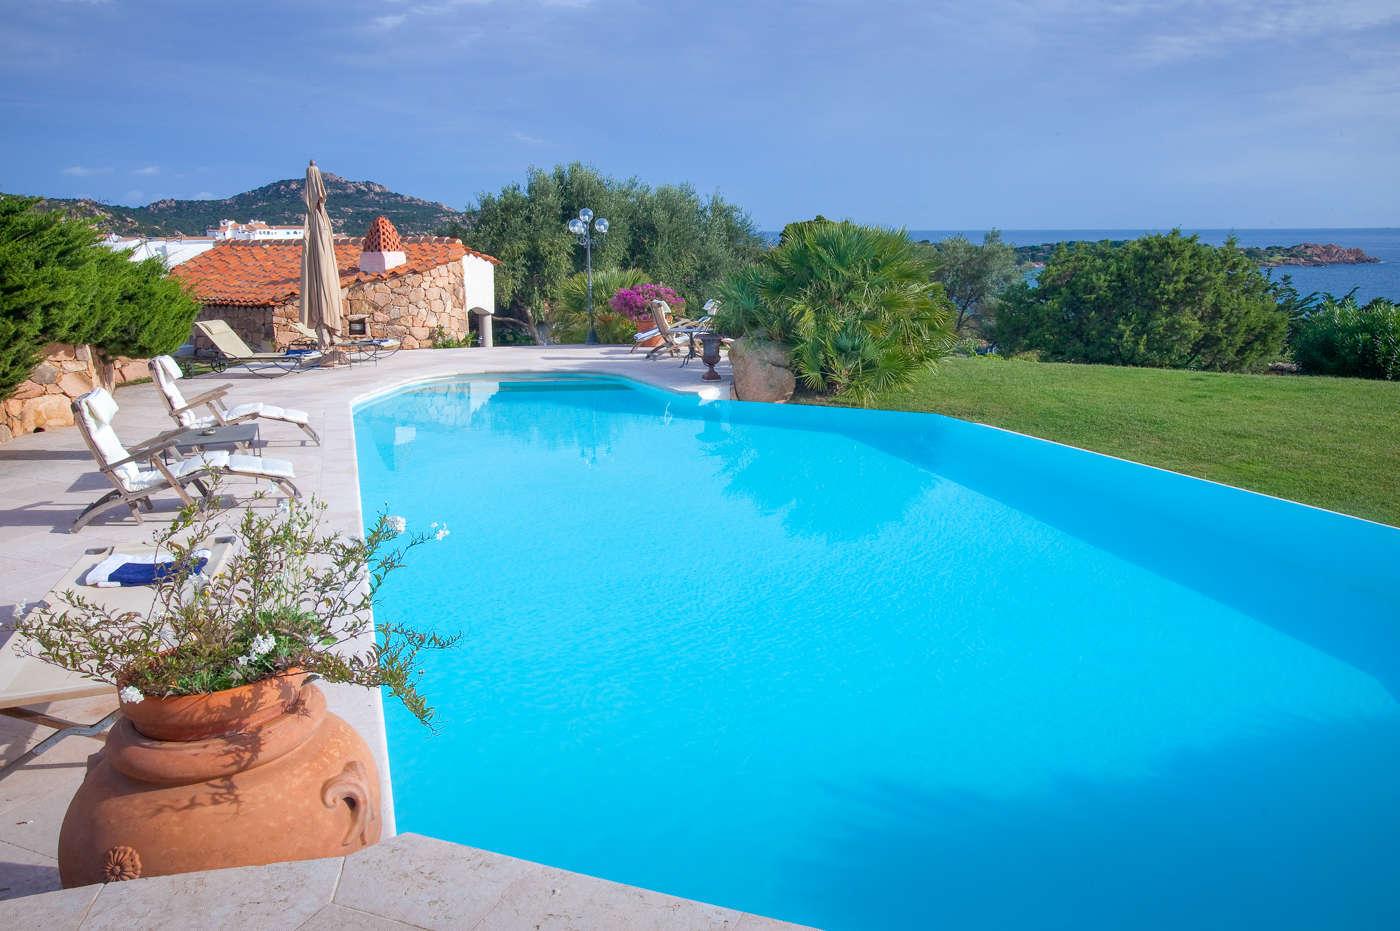 Luxury vacation rentals europe - Italy - Sardinia - Porto cervo - Erithia - Image 1/13